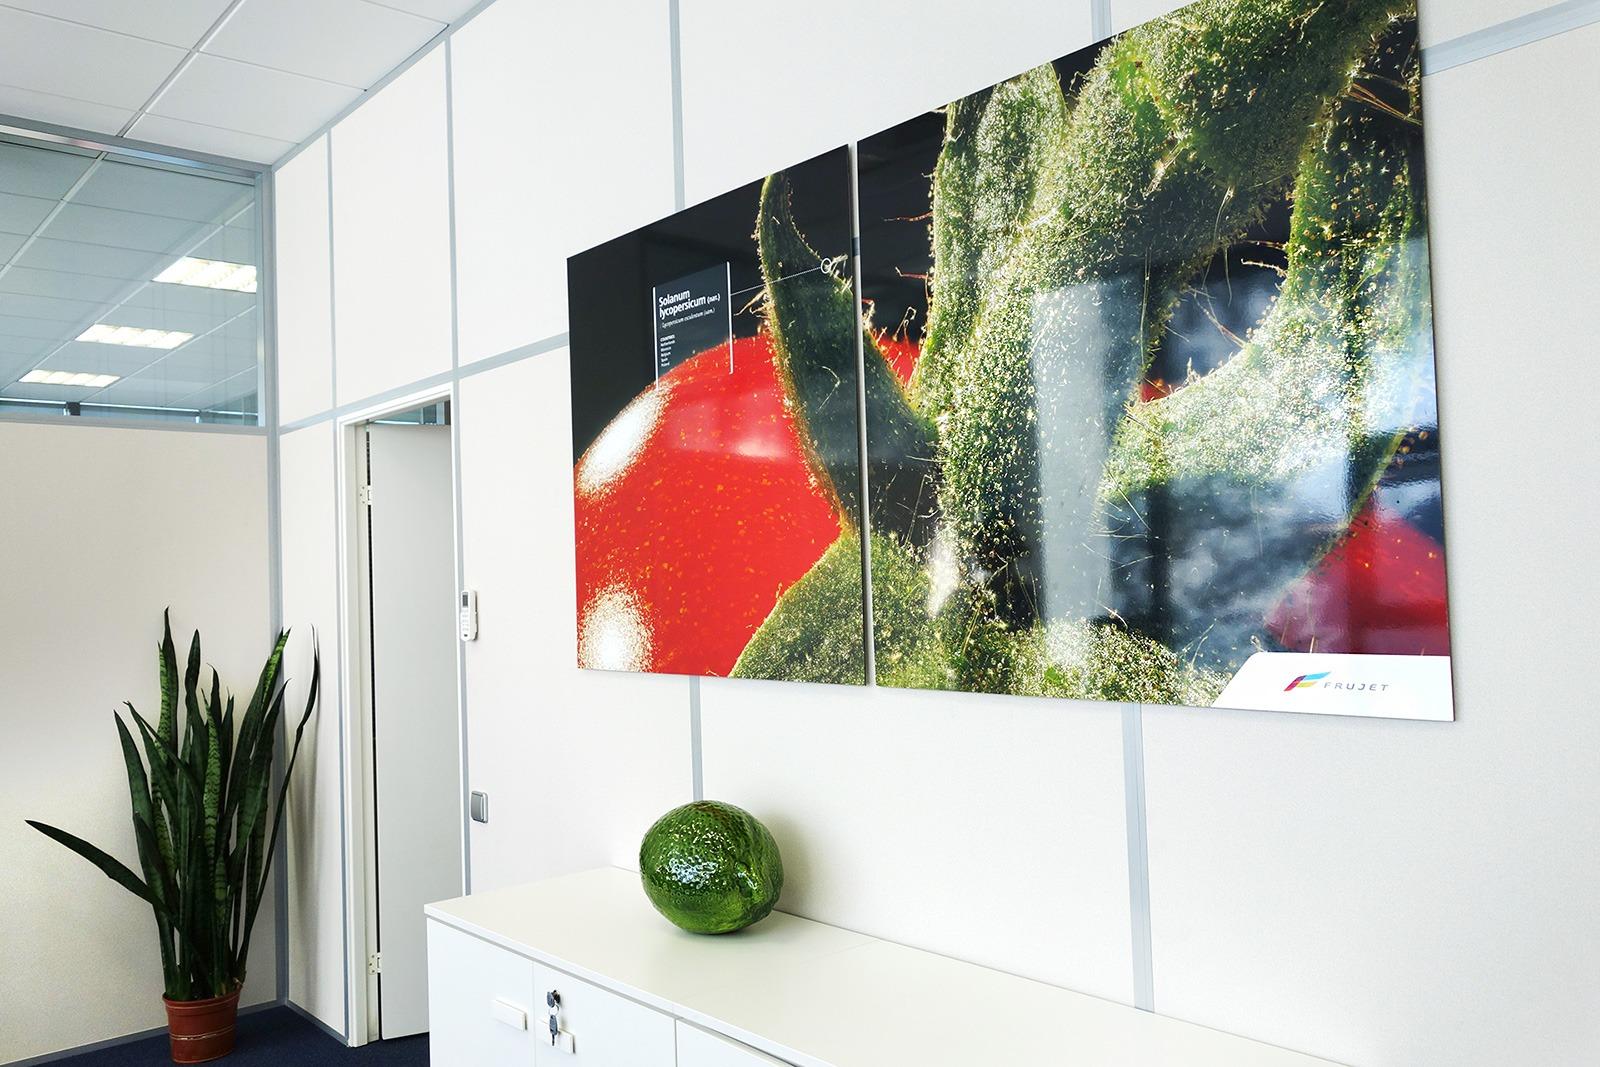 Агентство Асгард, фирменный стиль Frujet, брендирование интерьера, corporate interior